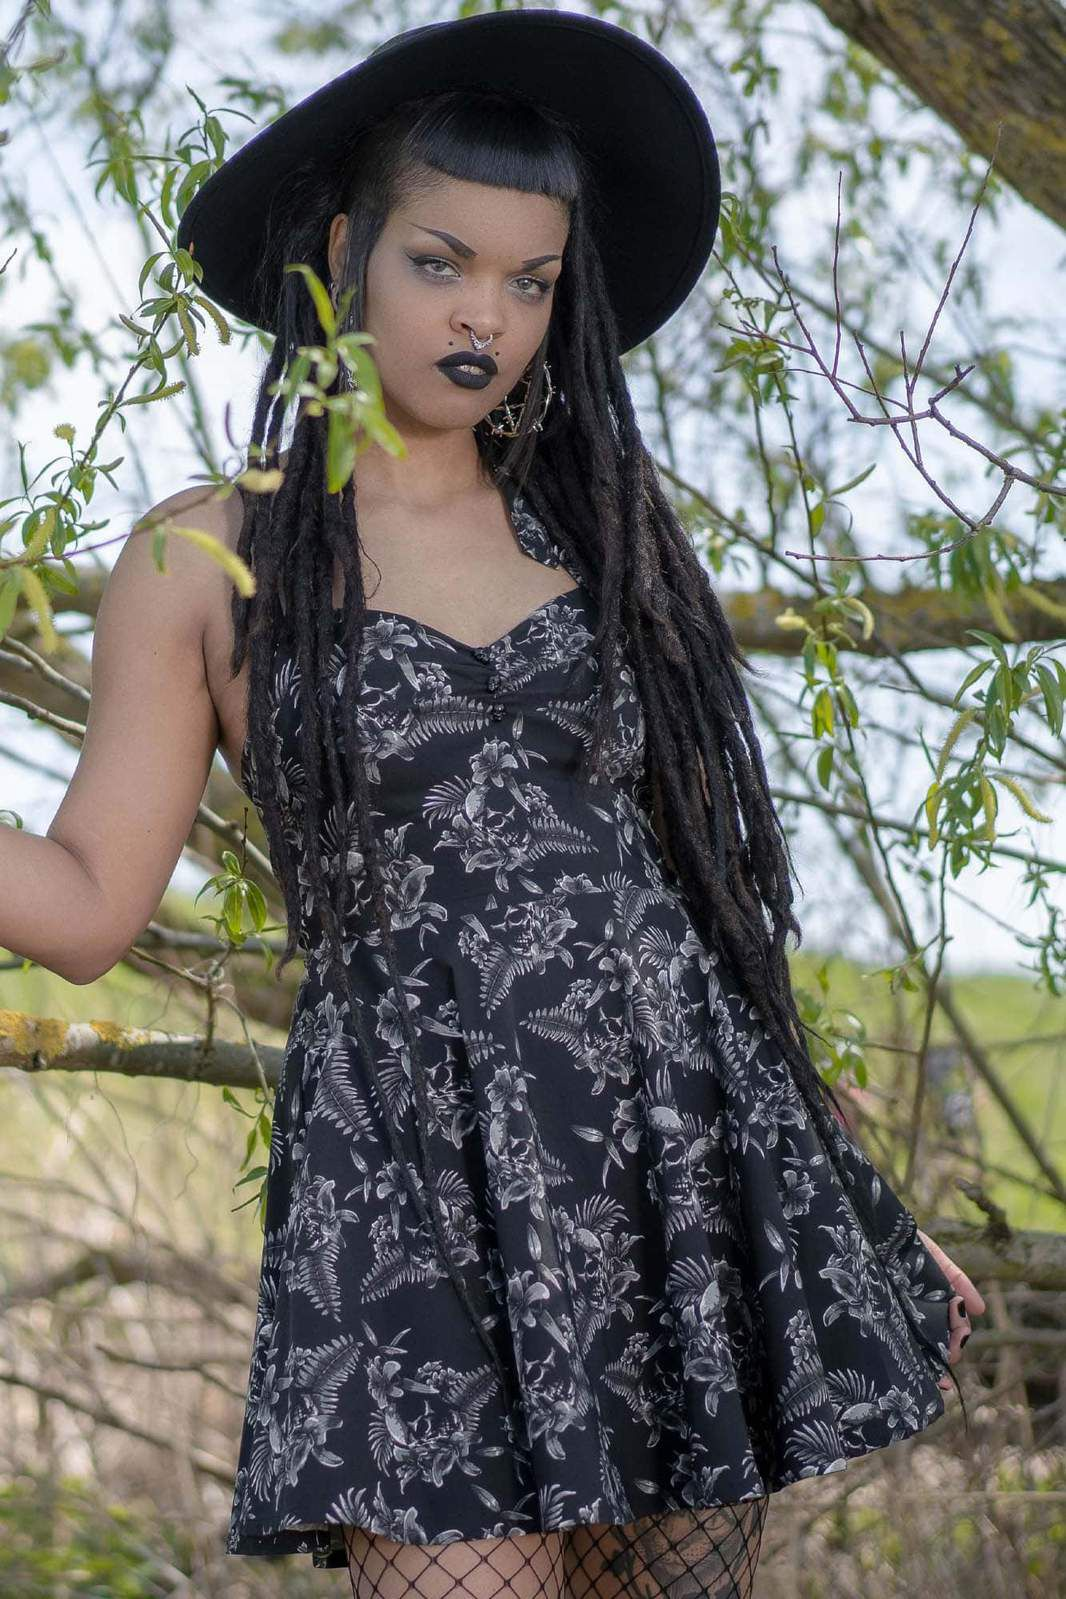 KS03318_robe-gothique-glam-rock-gothabilly-aloha-fromm-hell